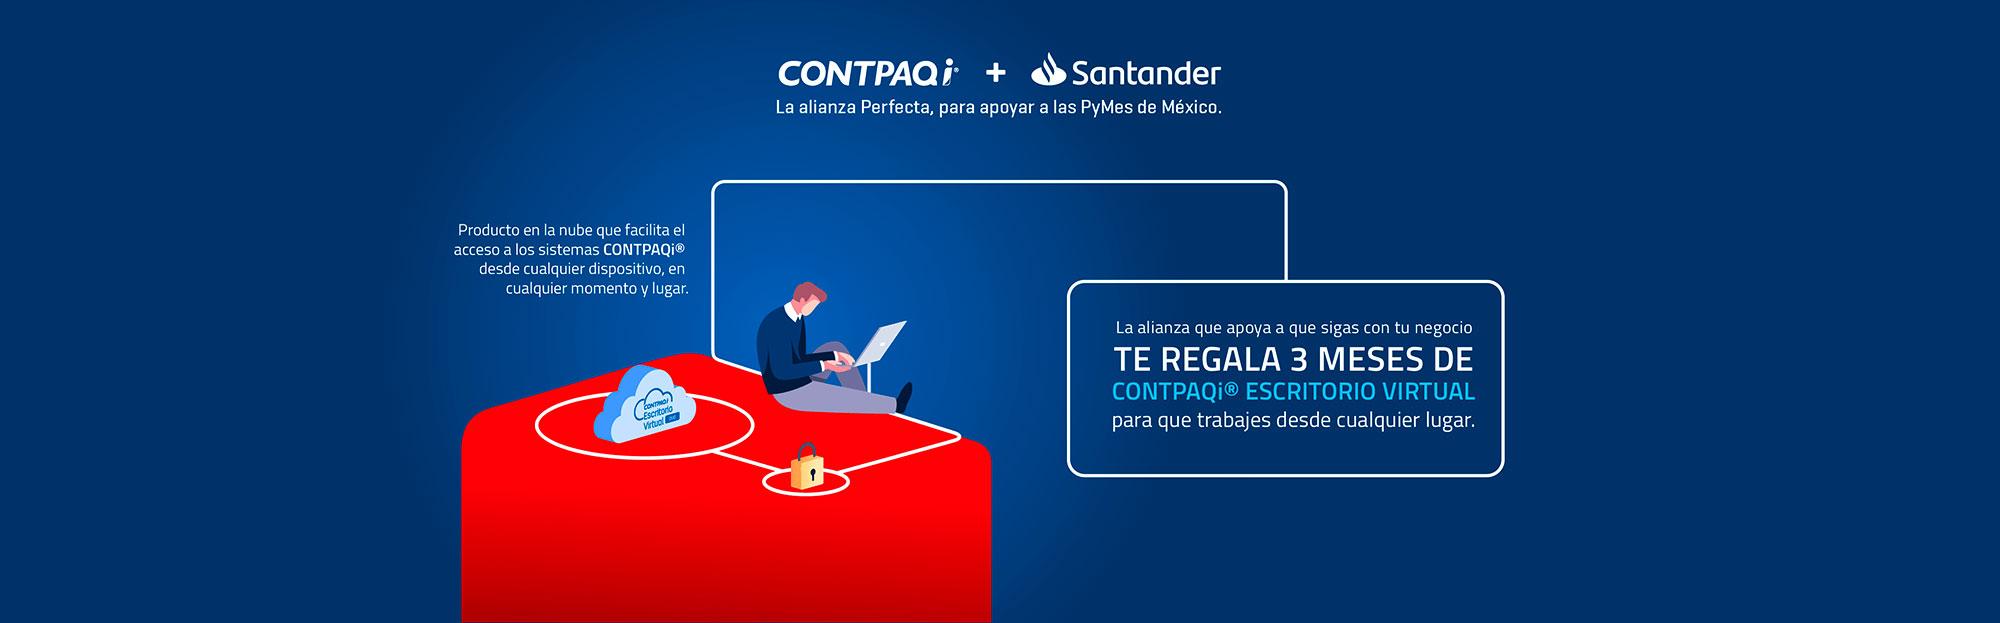 slider-alianza-contpaqi-santander